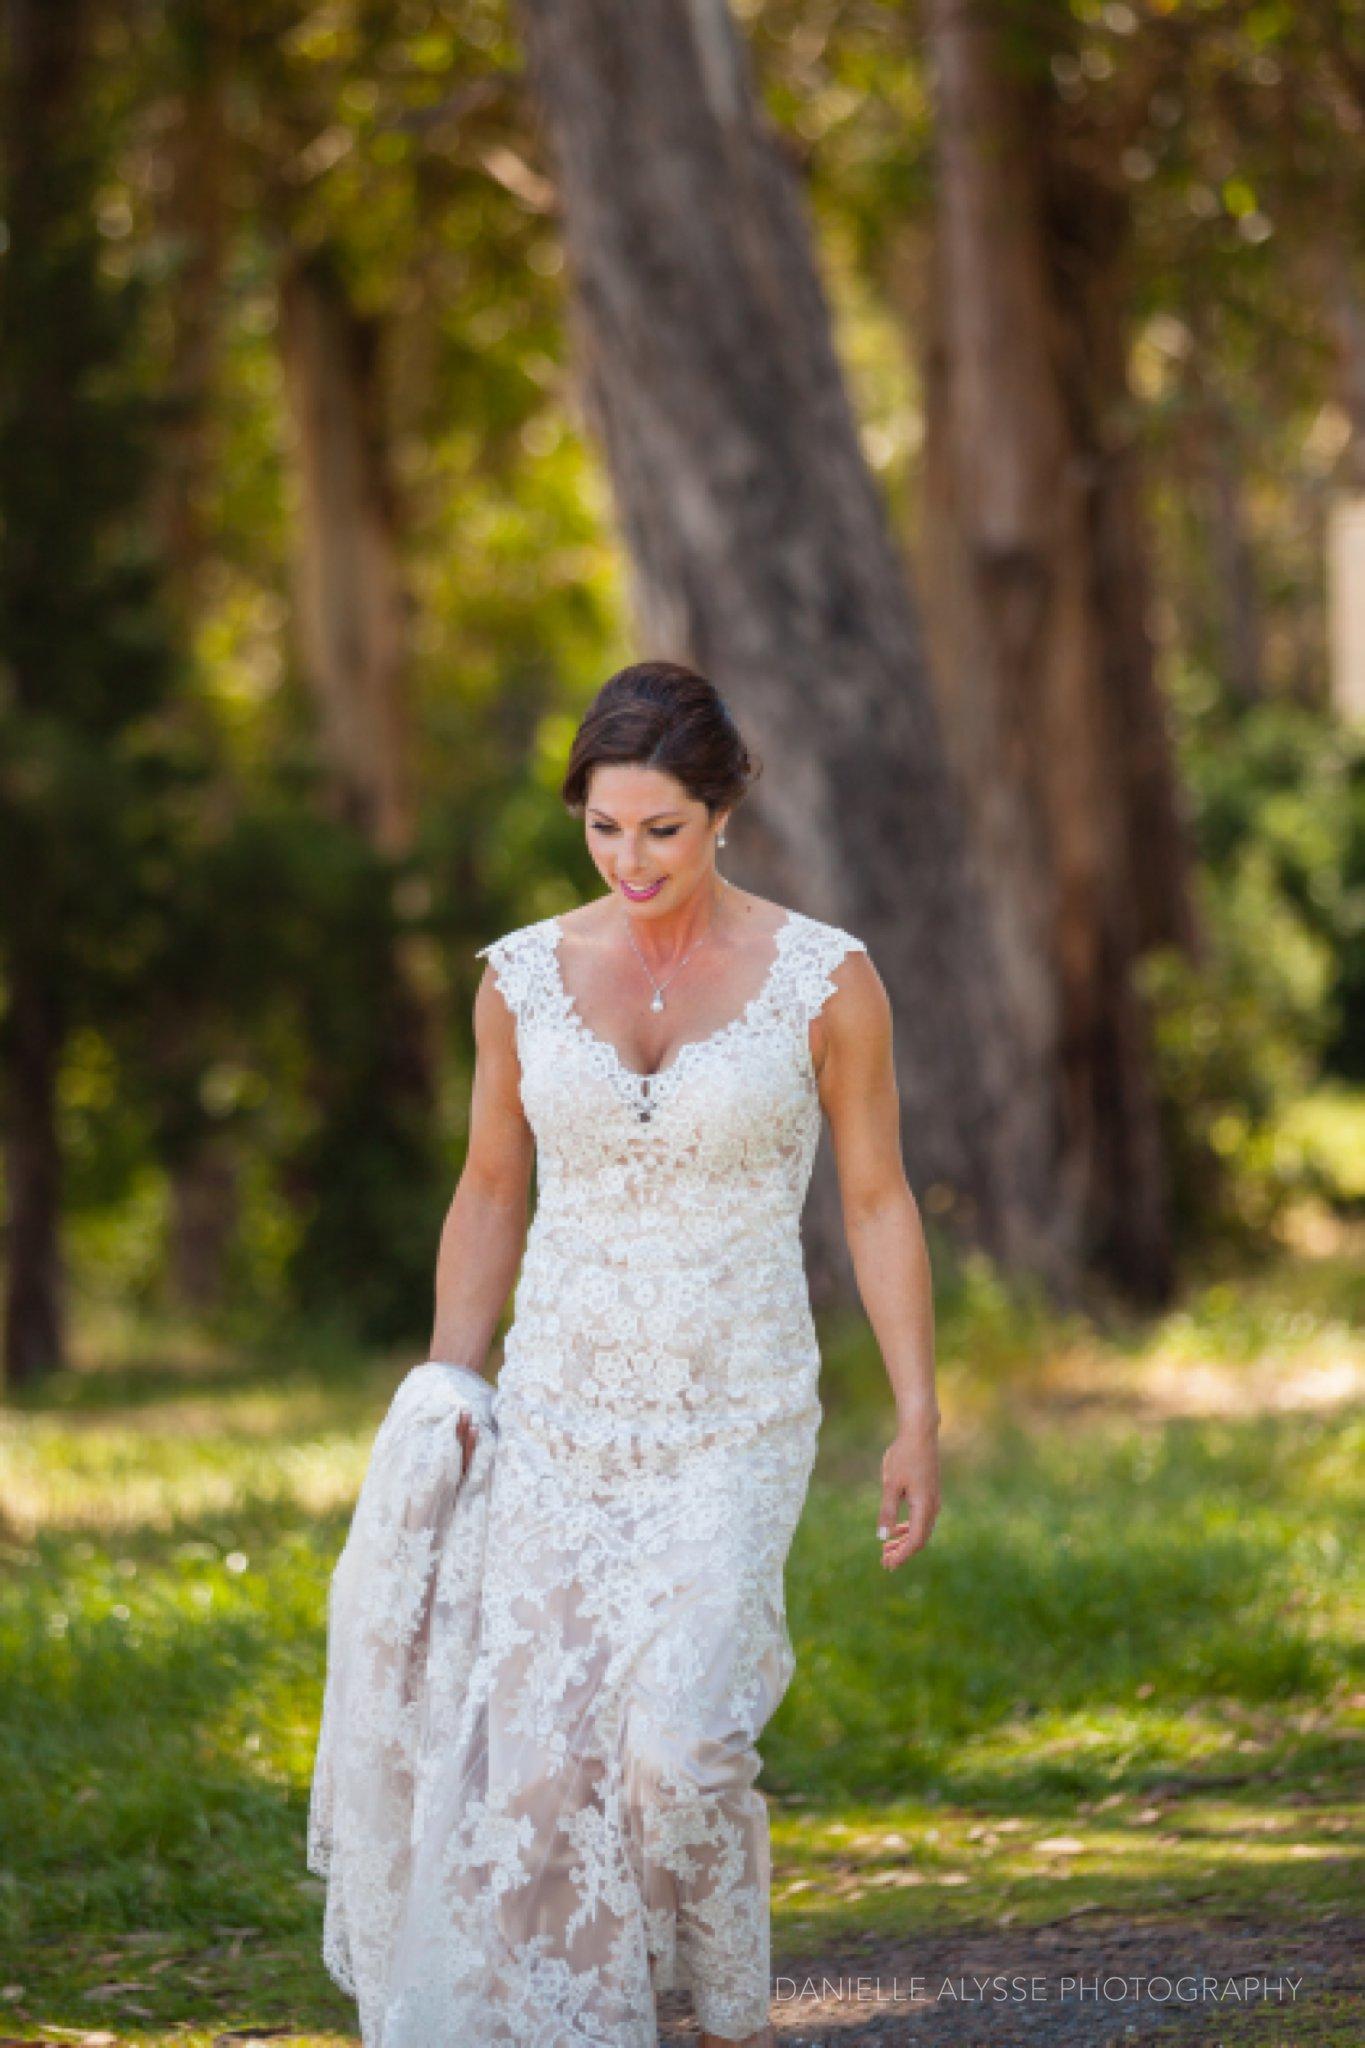 170429_blog_kimberly_ben_wedding_san_mateo_curiodyssey_danielle_alysse_photography_sacramento_photographer0143_WEB.jpg